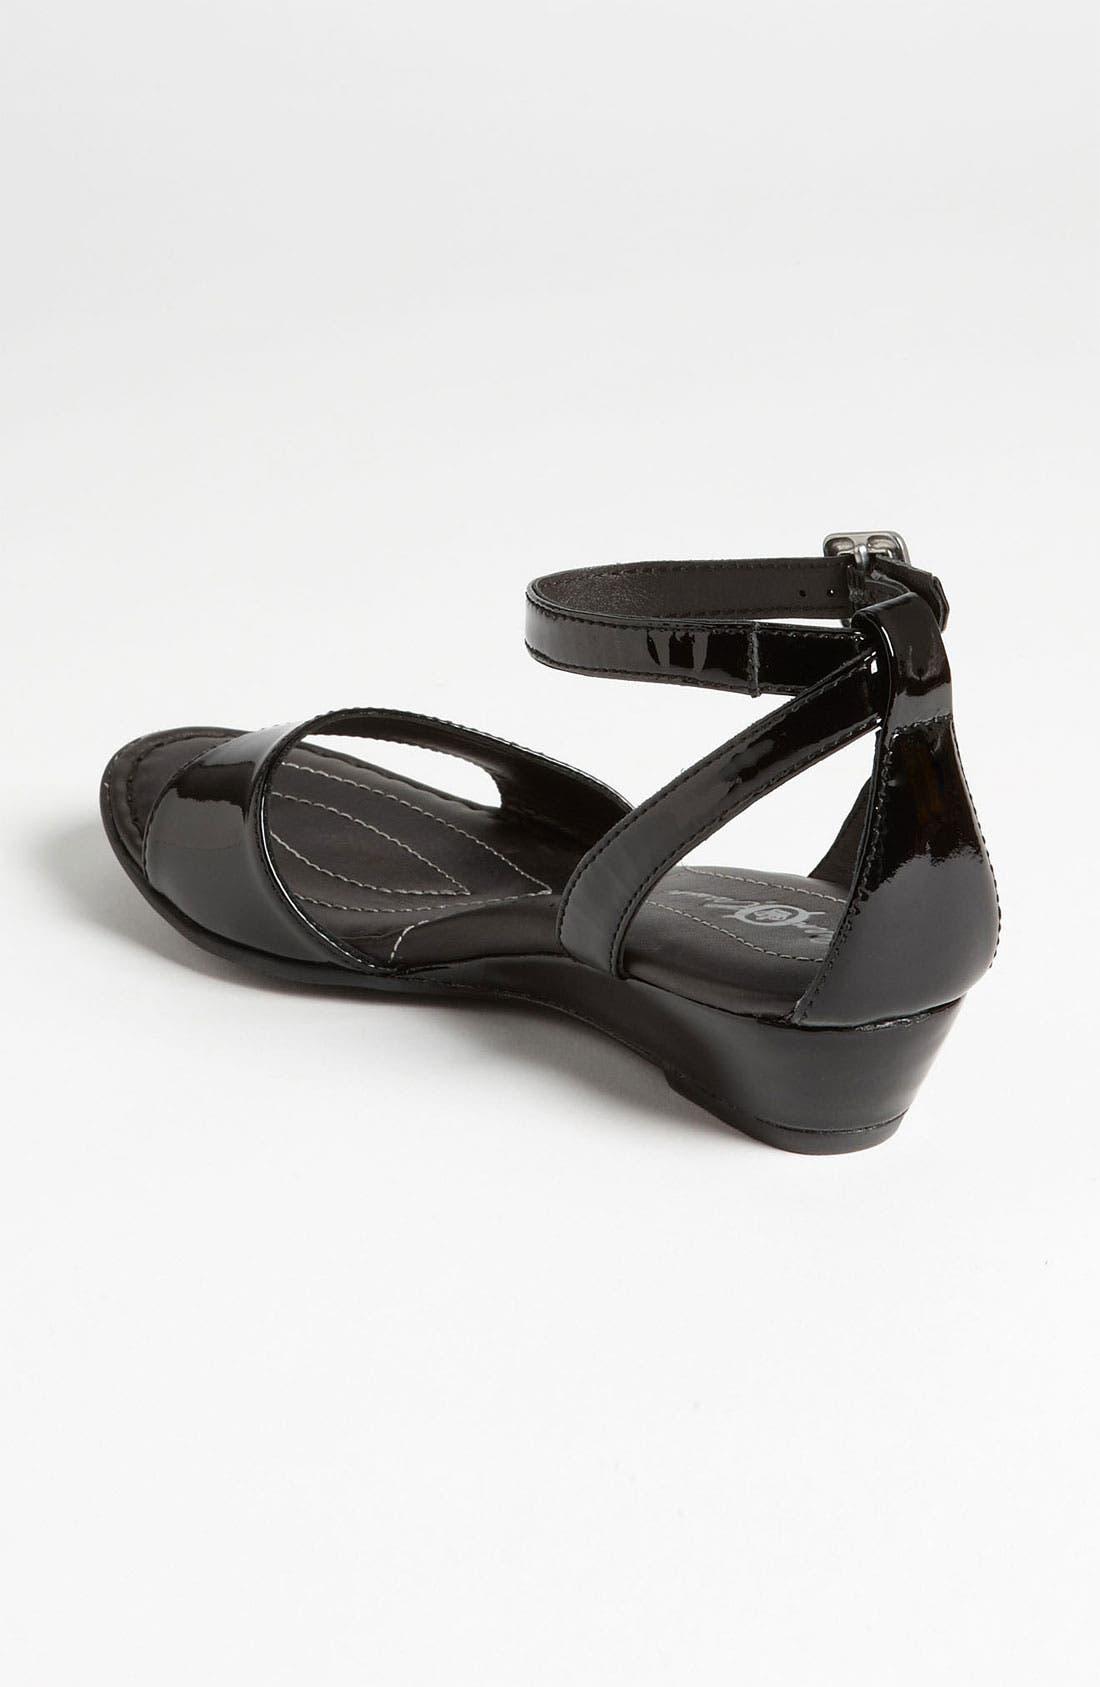 BØRN,                             Crown 'Landis' Sandal,                             Alternate thumbnail 4, color,                             001